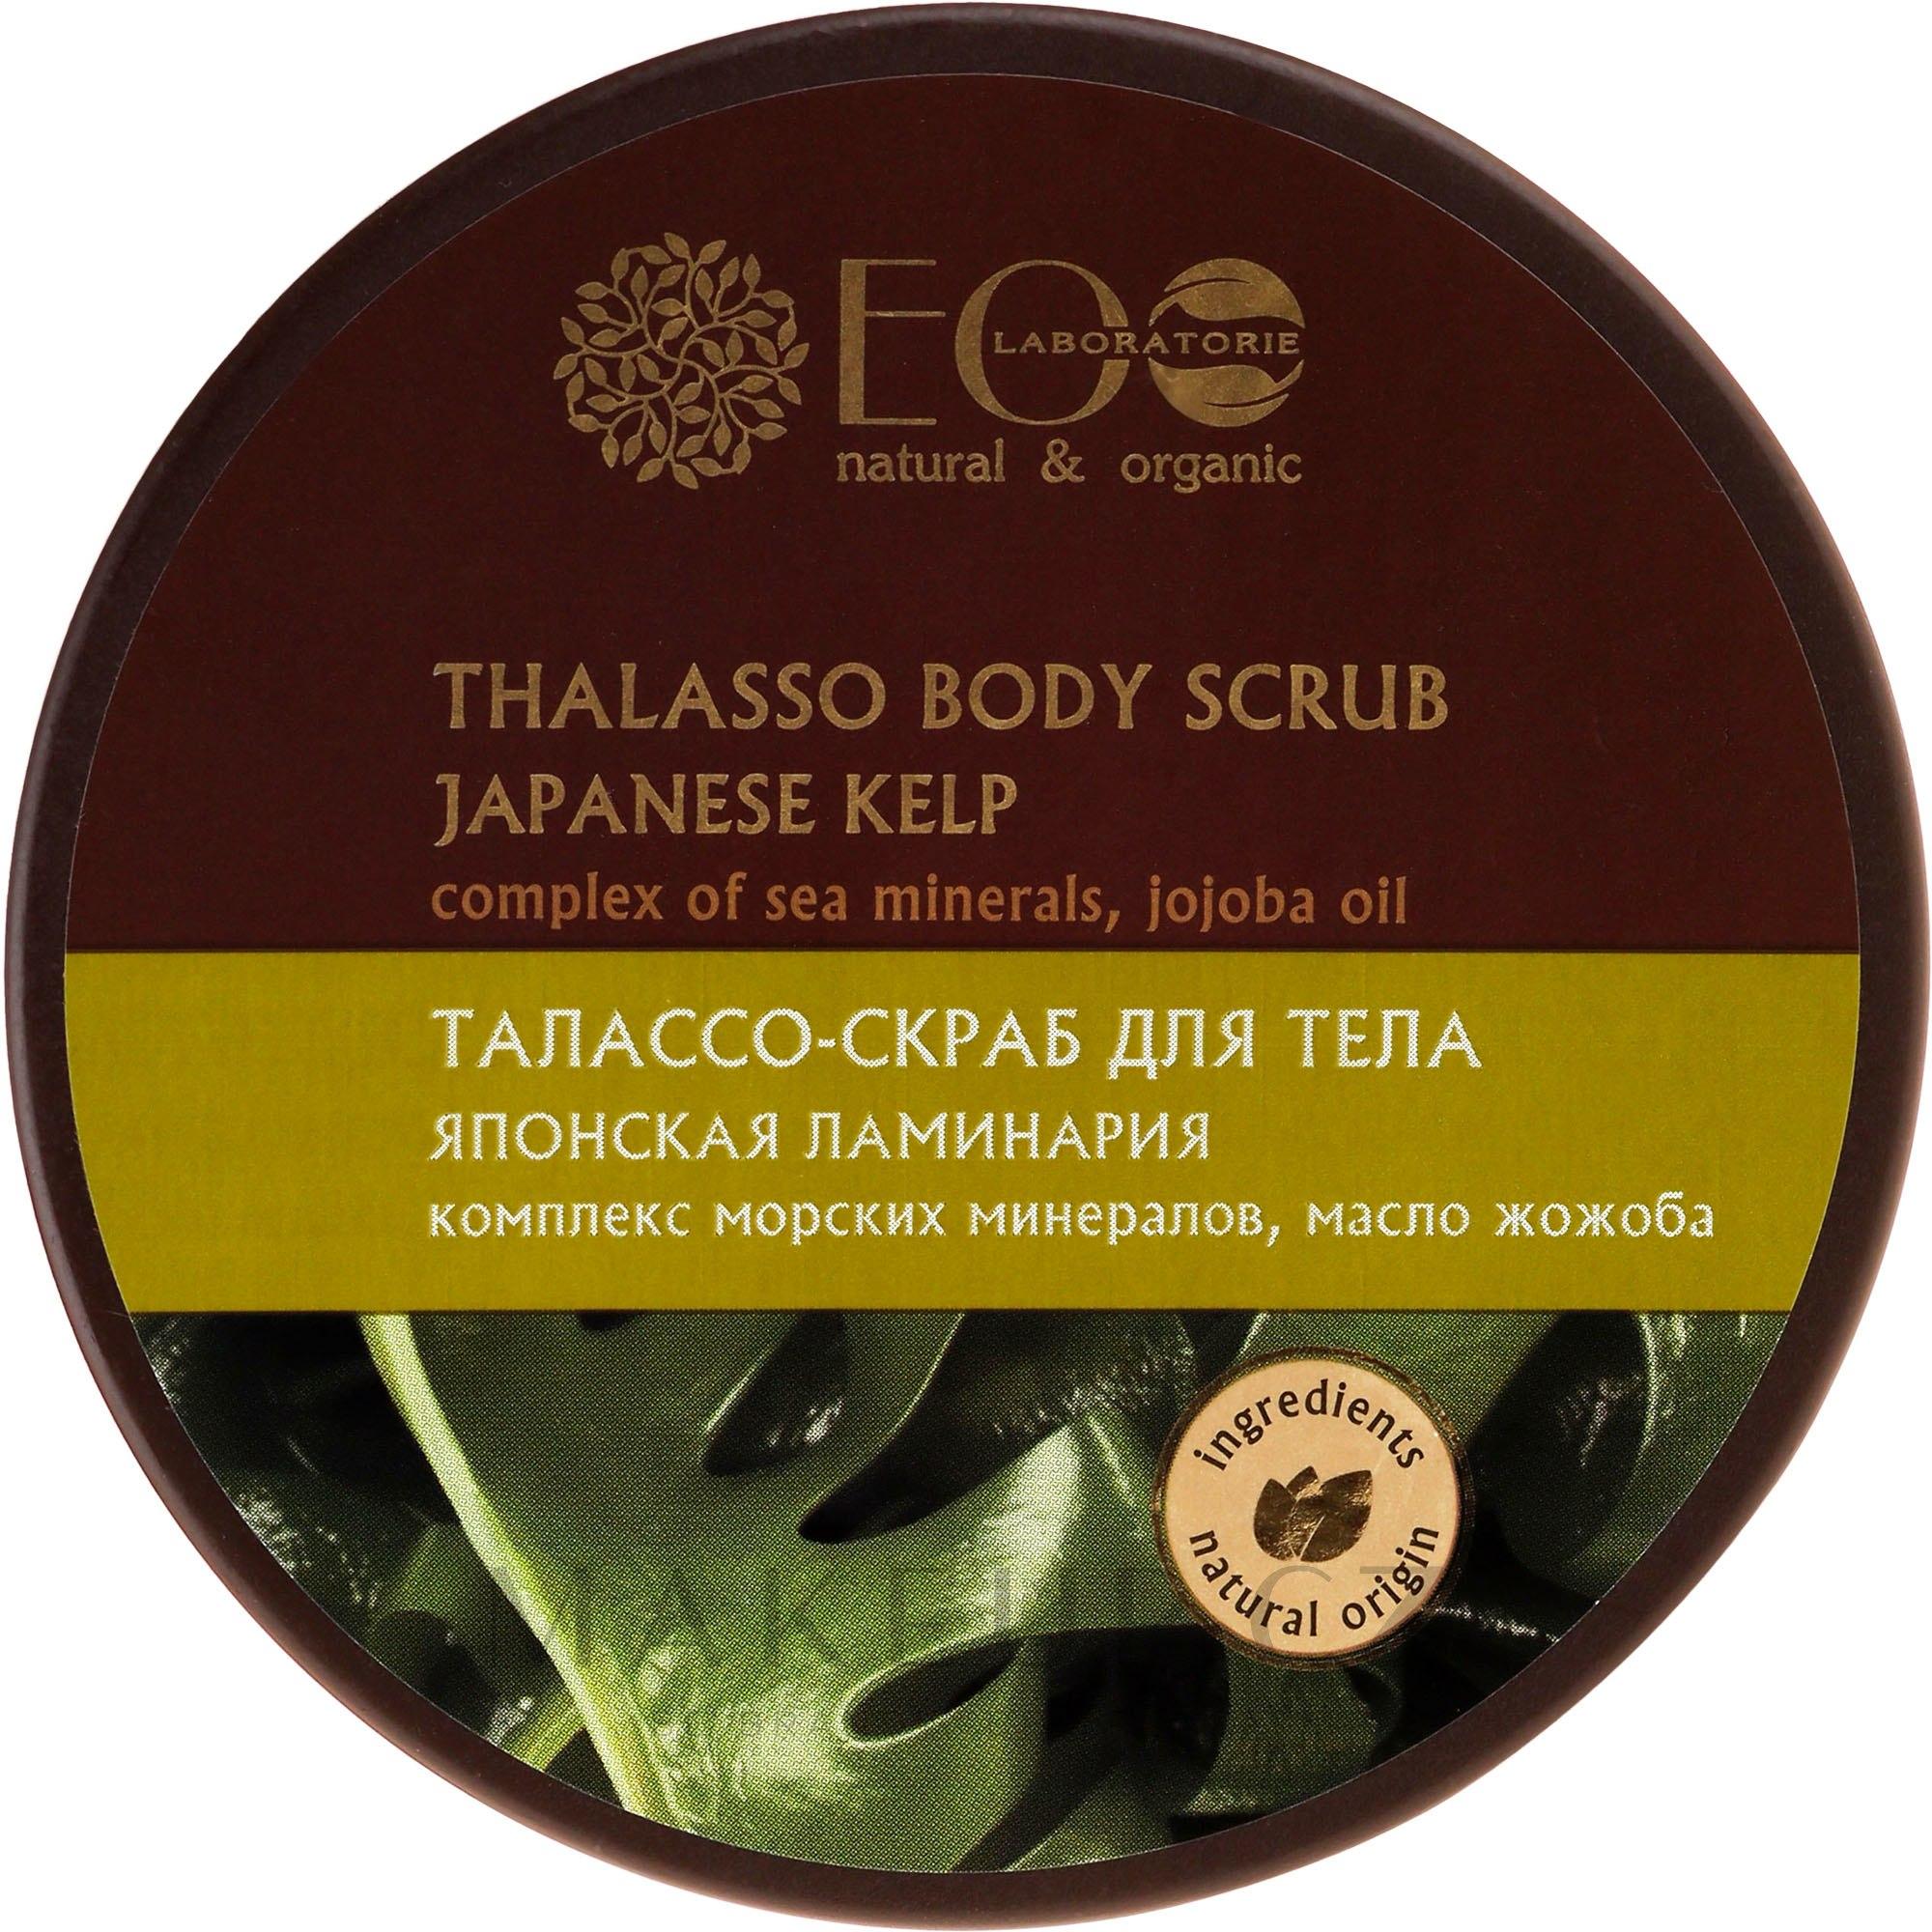 Tělový peeling THALASSO SCRUB Japonské laminárie - ECO Laboratorie Thalasso Body Scrub — foto 250 ml